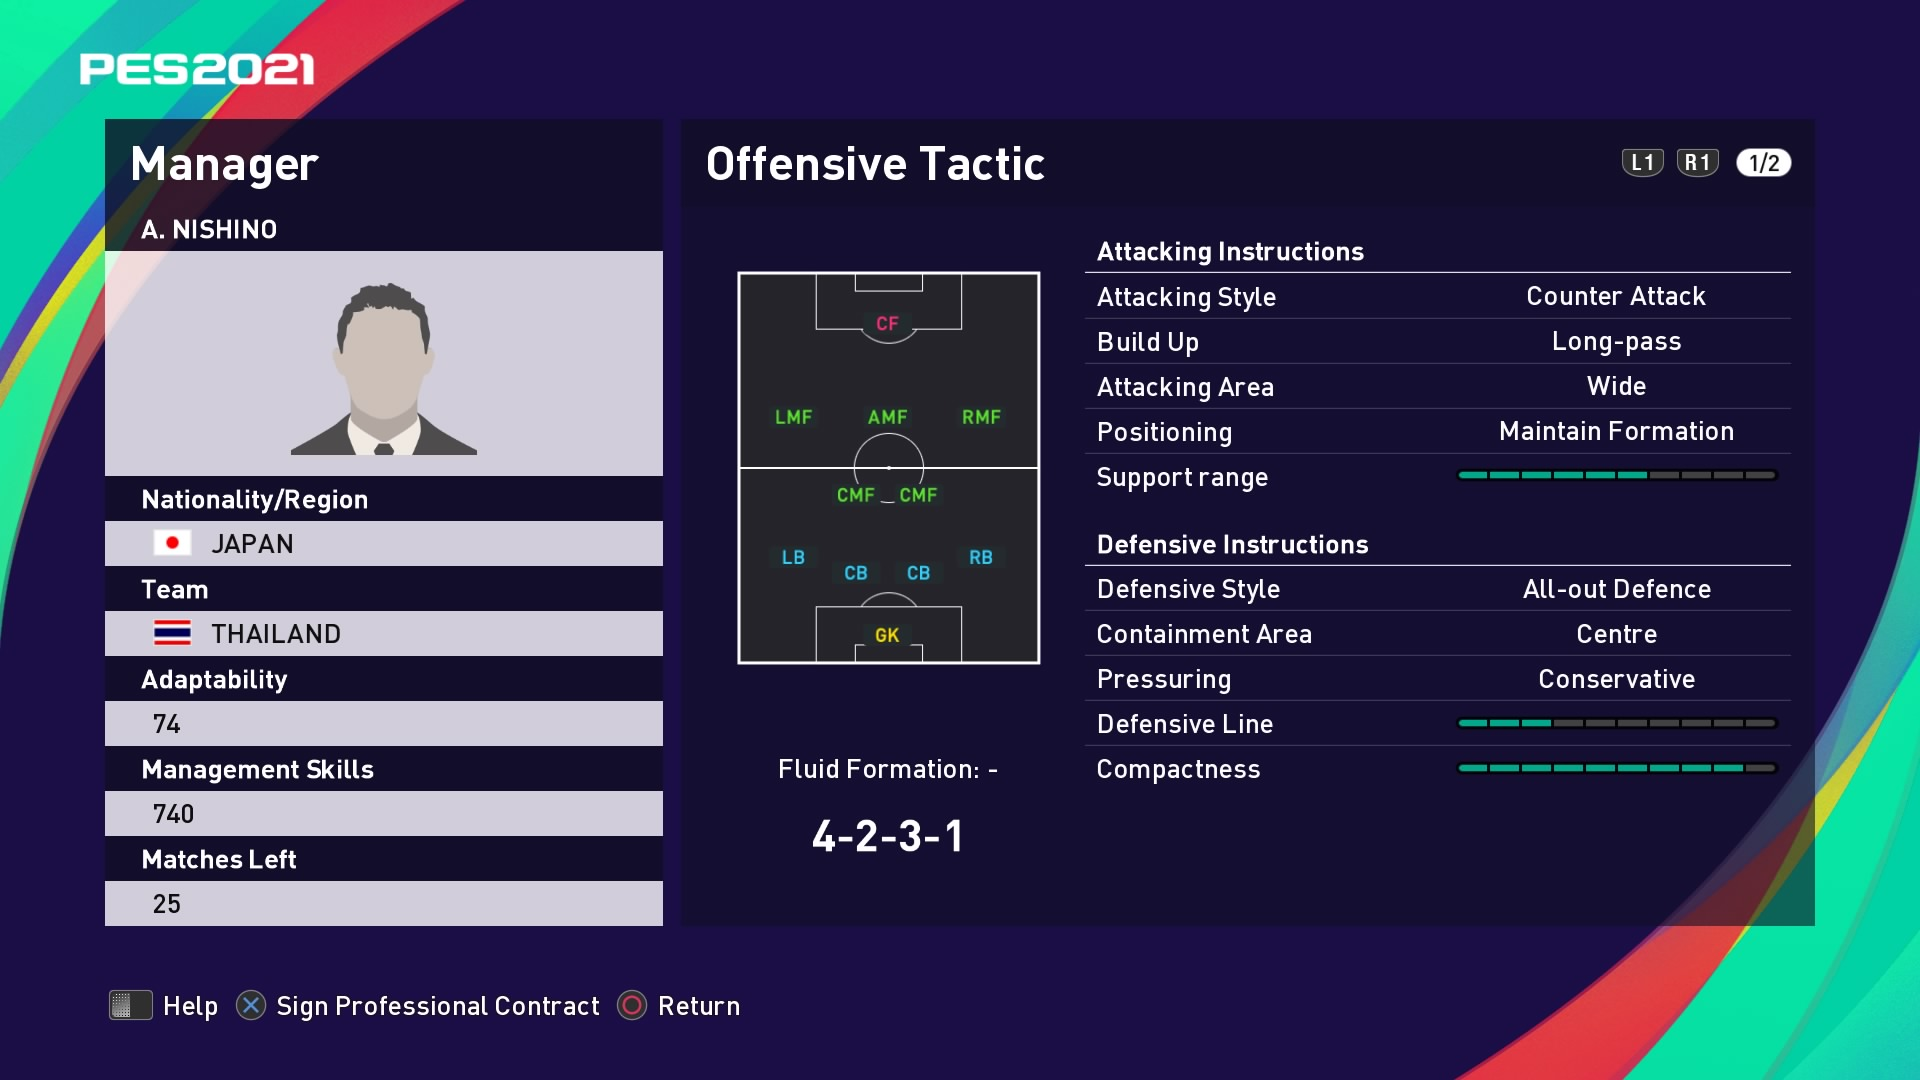 A. Nishino (Akira Nishino) Offensive Tactic in PES 2021 myClub